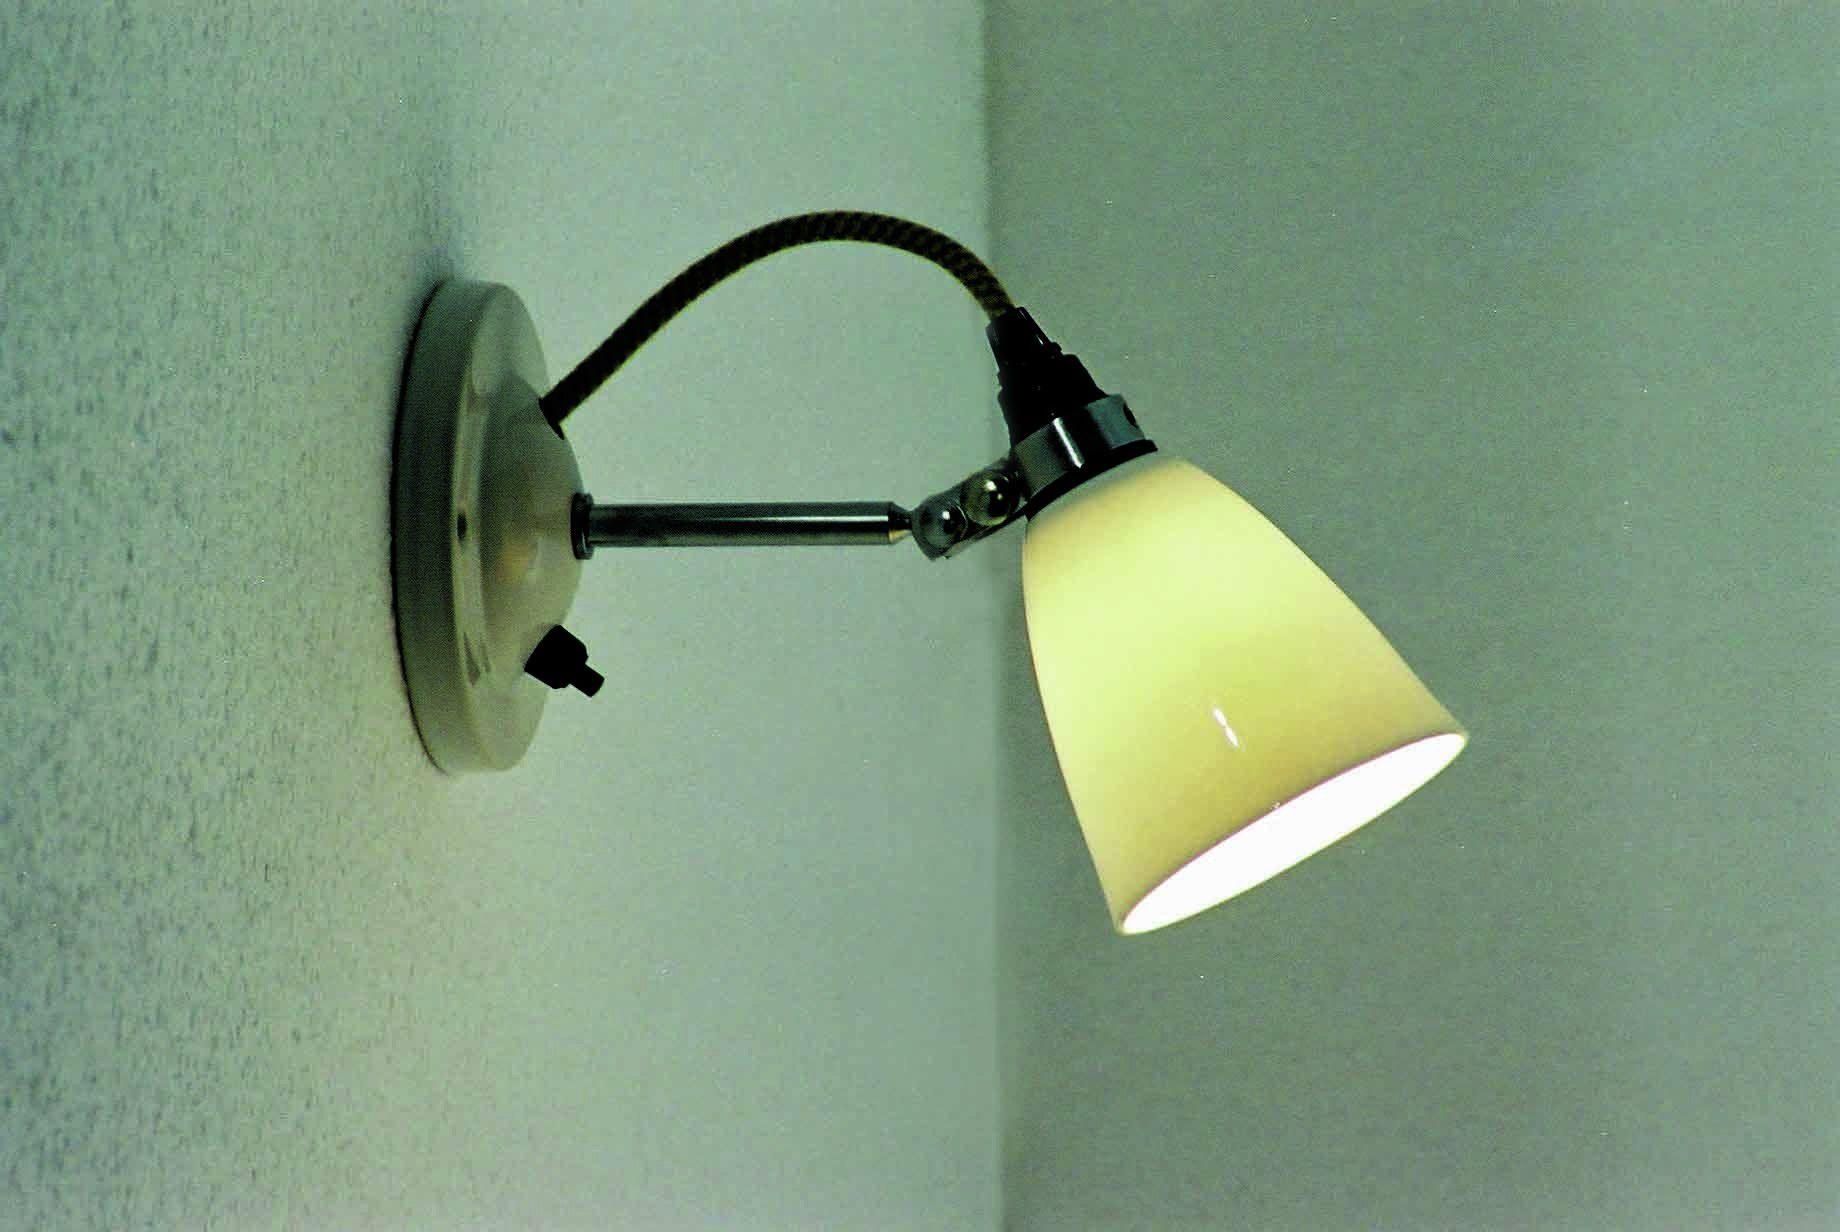 BTC Hector Small Wall Lamp - Google Search | Lighting | Pinterest ...